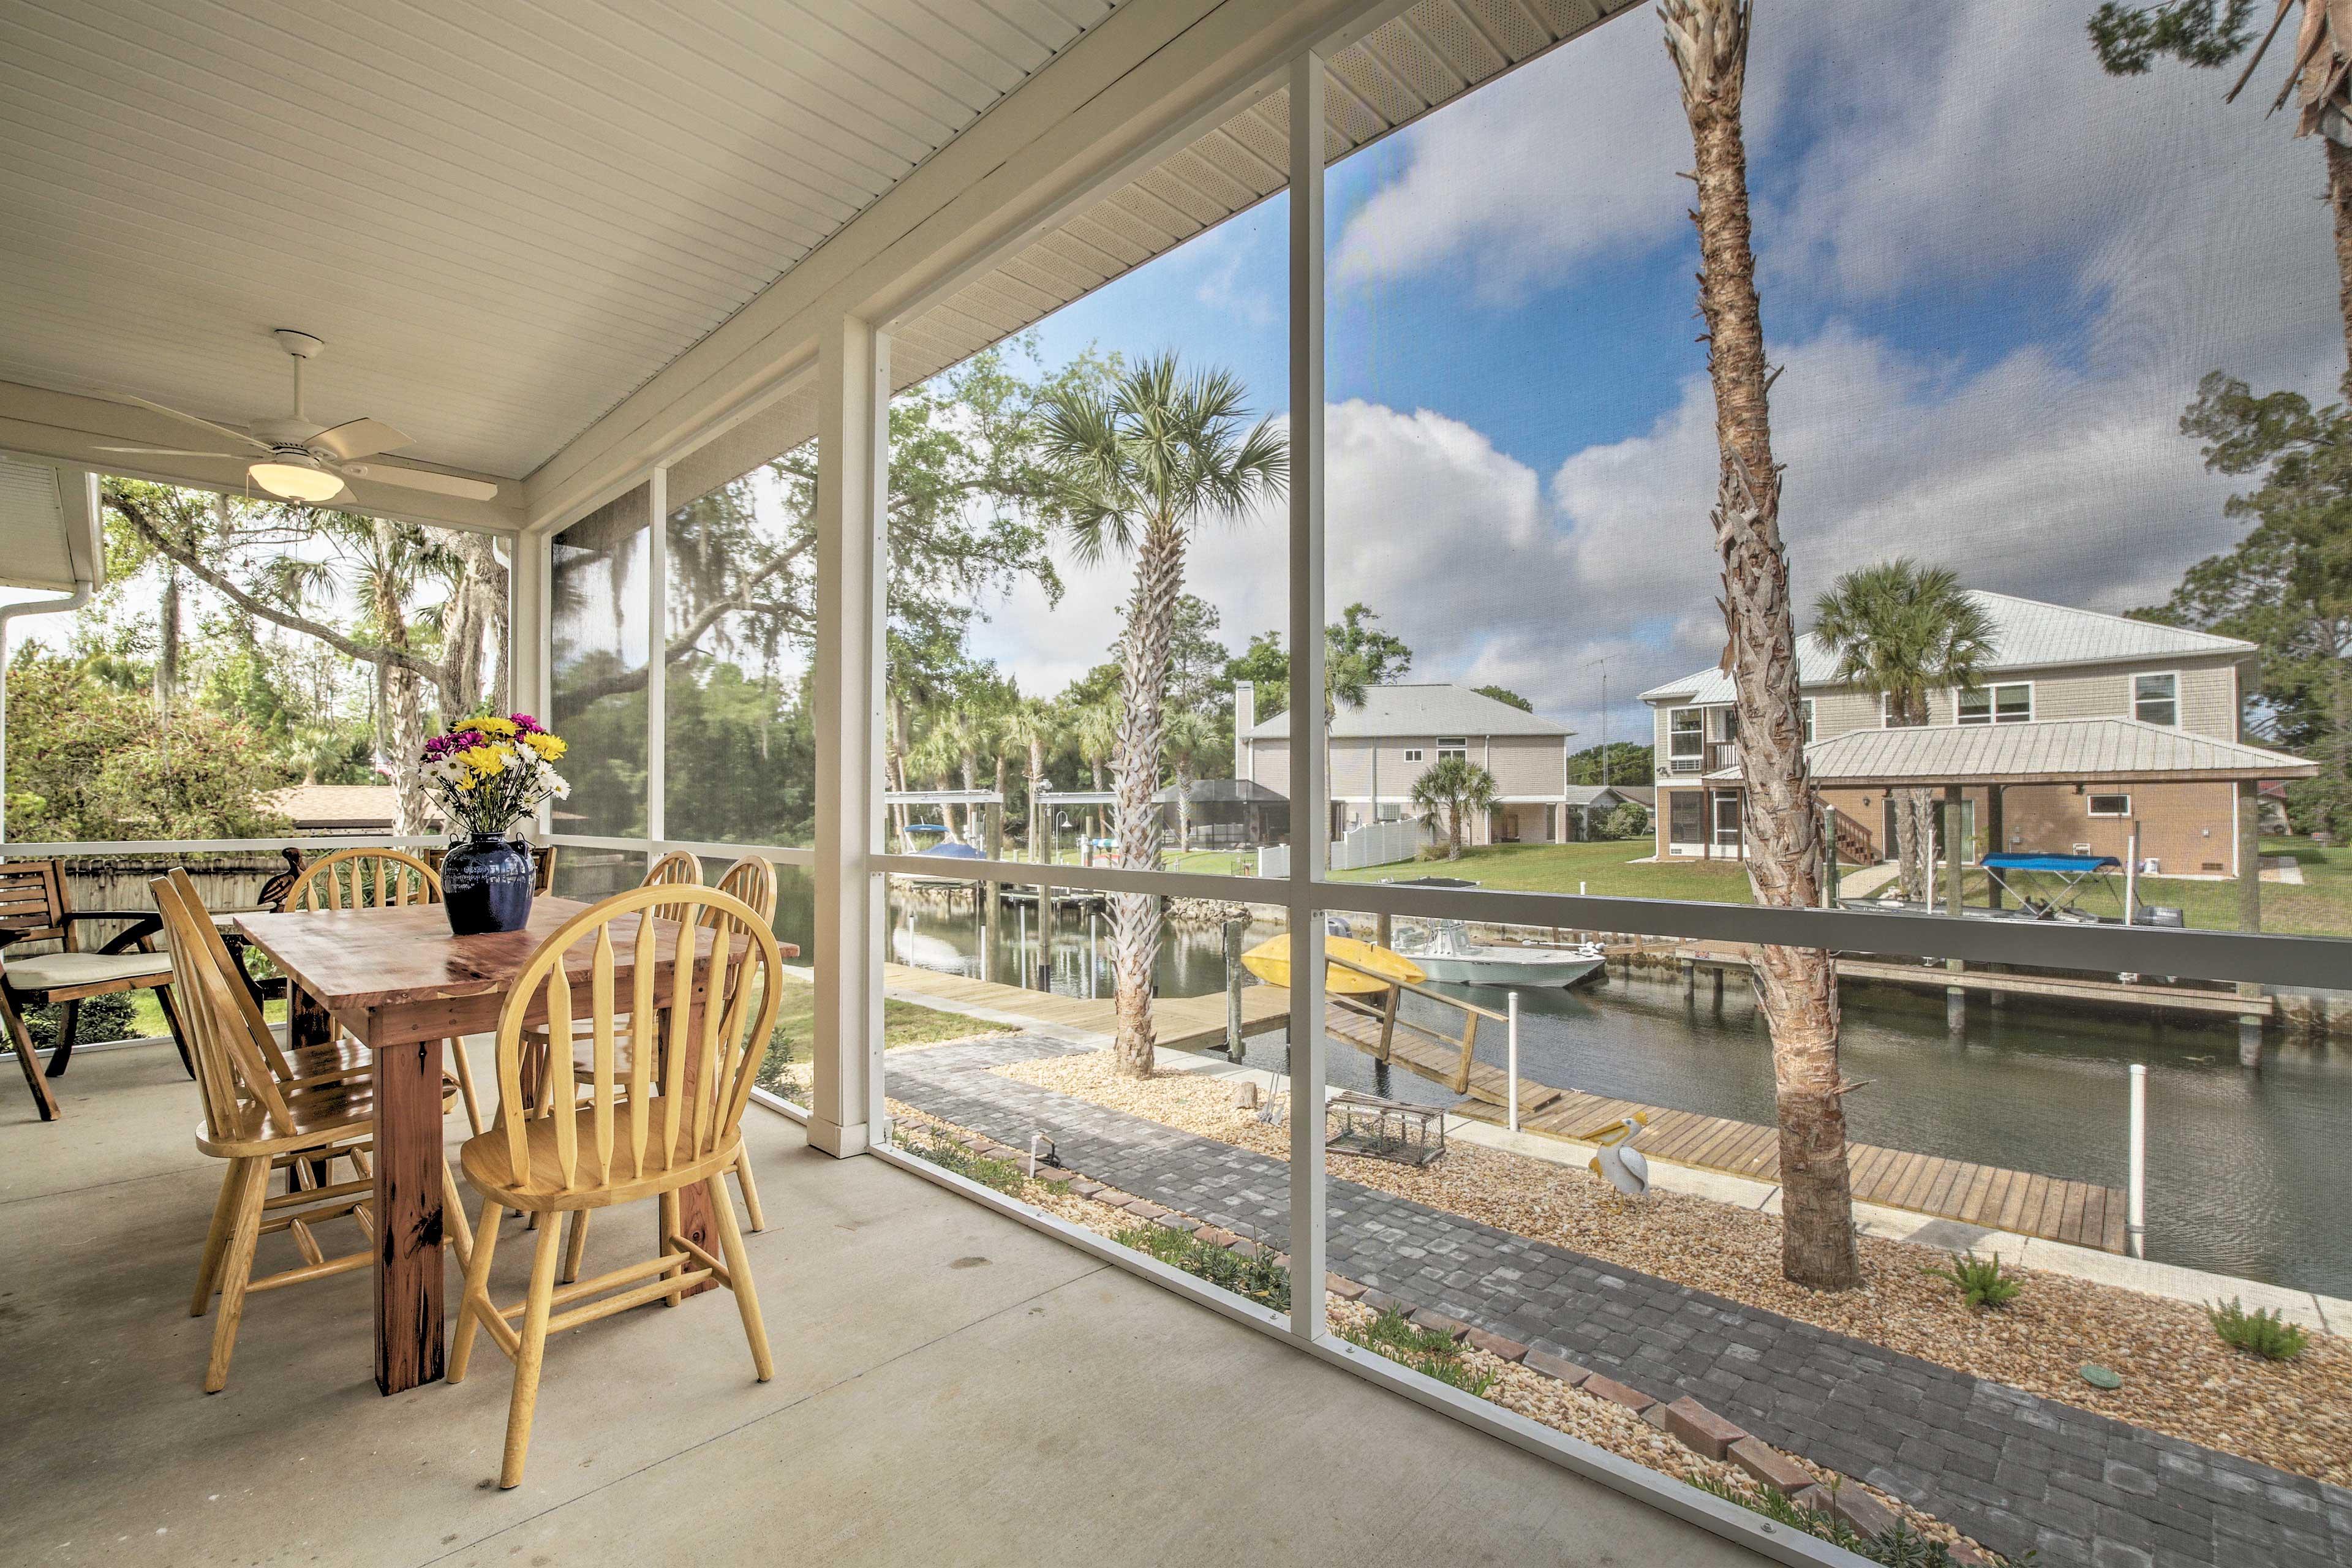 Enjoy breakfast on the screened porch.